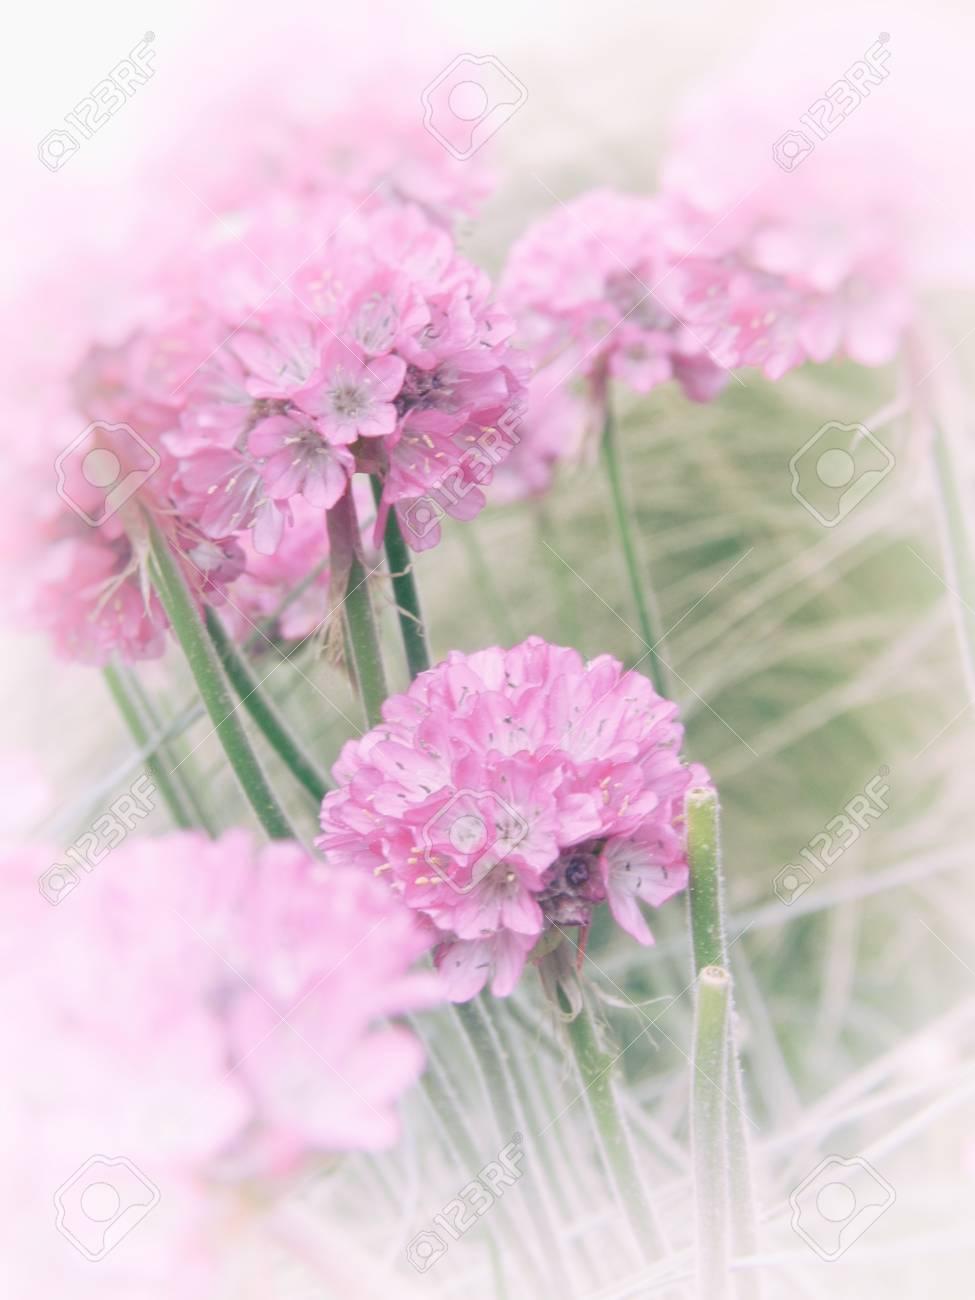 Several pink allium flowers in a garden border pale blur vignette several pink allium flowers in a garden border pale blur vignette delicate flower image mightylinksfo